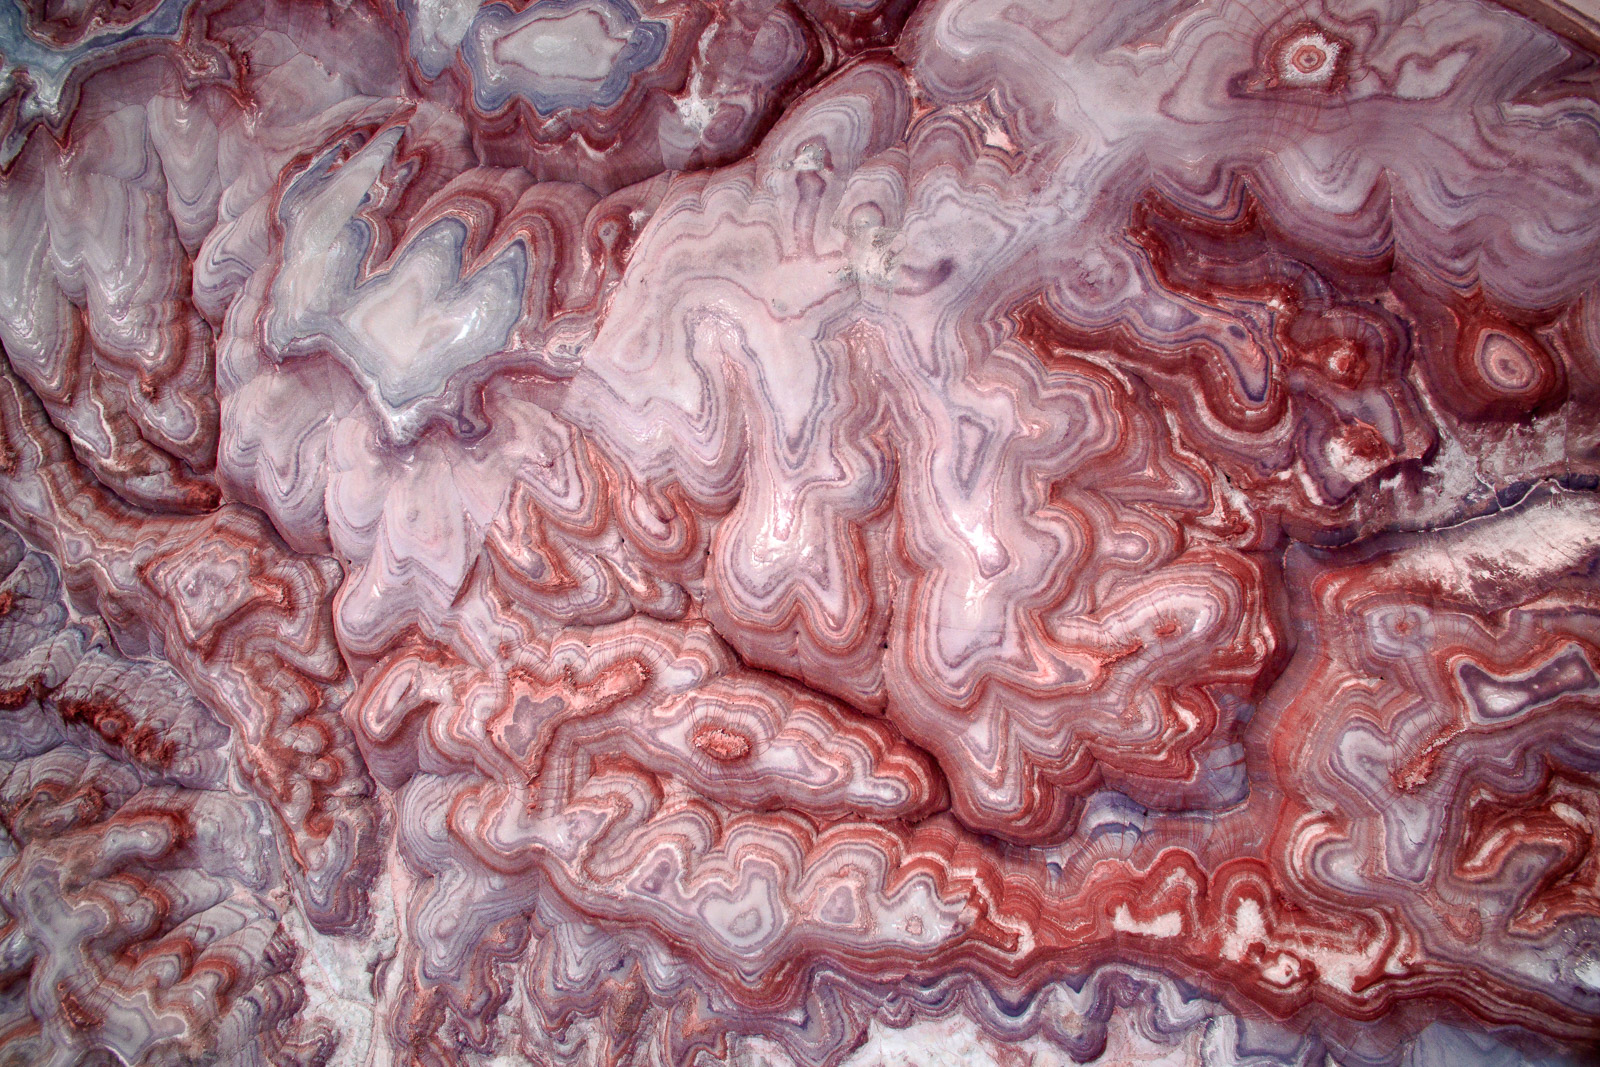 Badlands captured from above in a remote desert location outside of Hanksville, Utah.